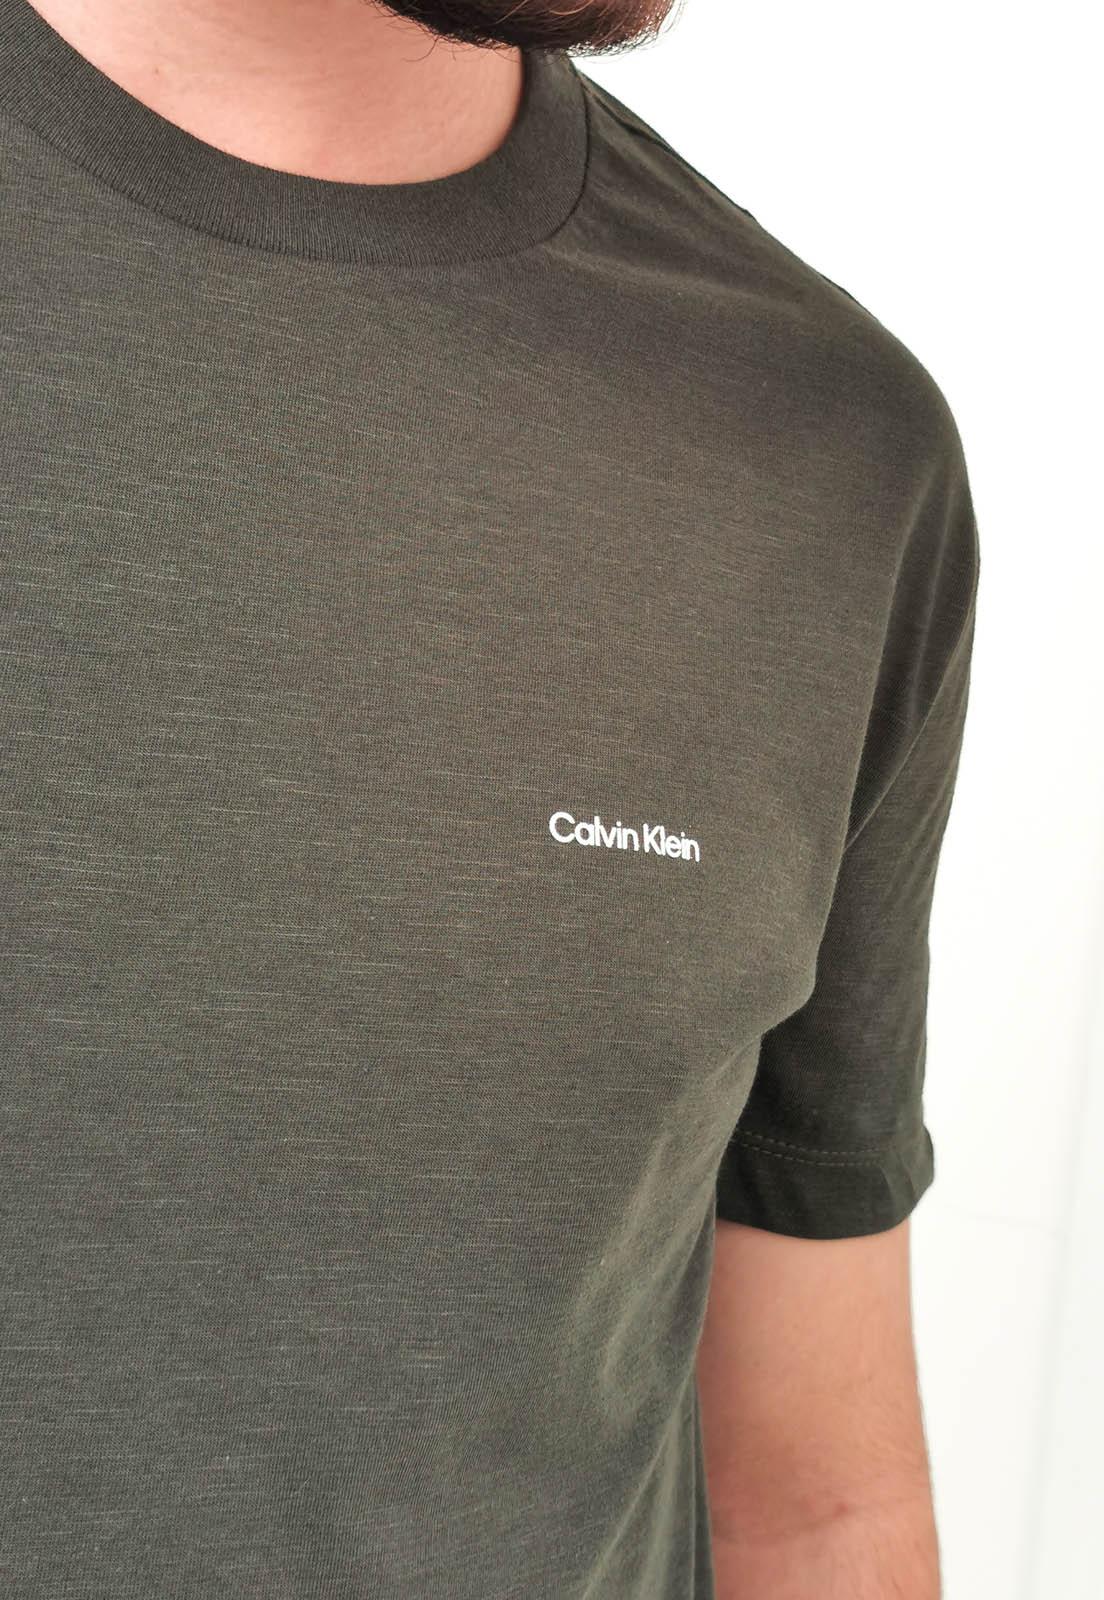 Camiseta Calvin Klein Básica Verde Militar